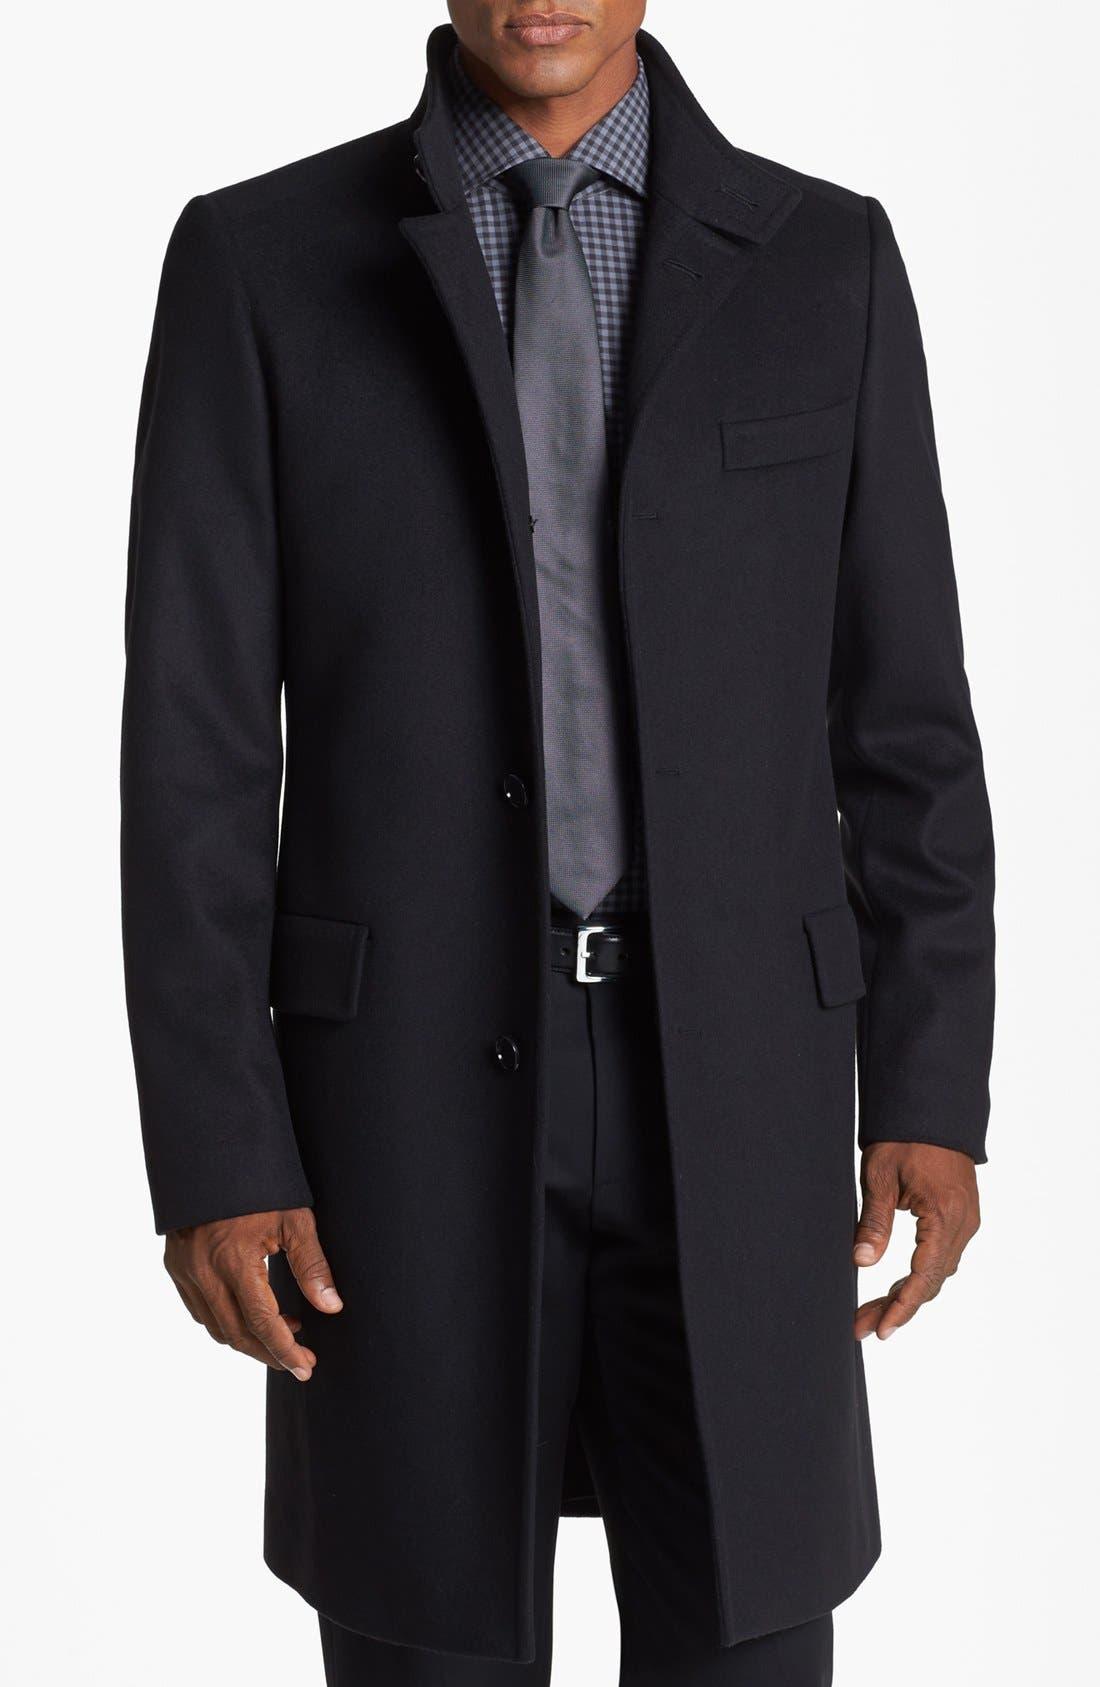 BOSS HUGO BOSS 'Sintrax' Wool Blend Coat, Main, color, 001